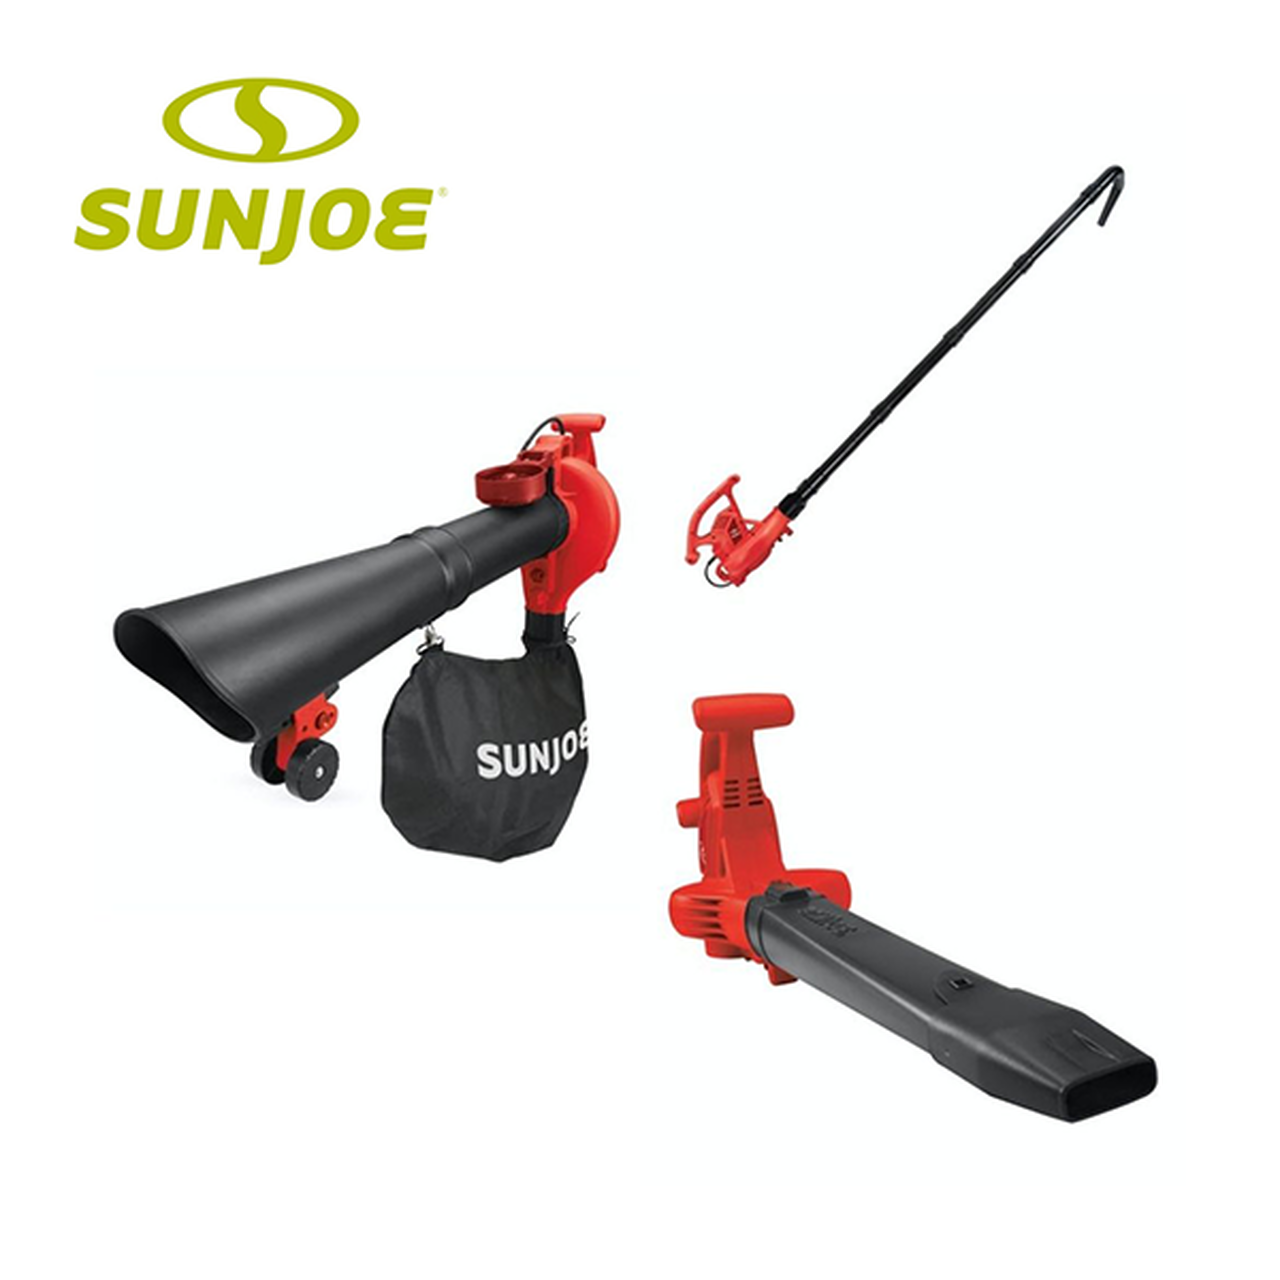 Sun Joe: 4-in-1 Electric Blower, Leaf Vacuum, Mulcher & Gutter Cleaner! .99 (REG 9.99) + Free Shipping at Until Gone!